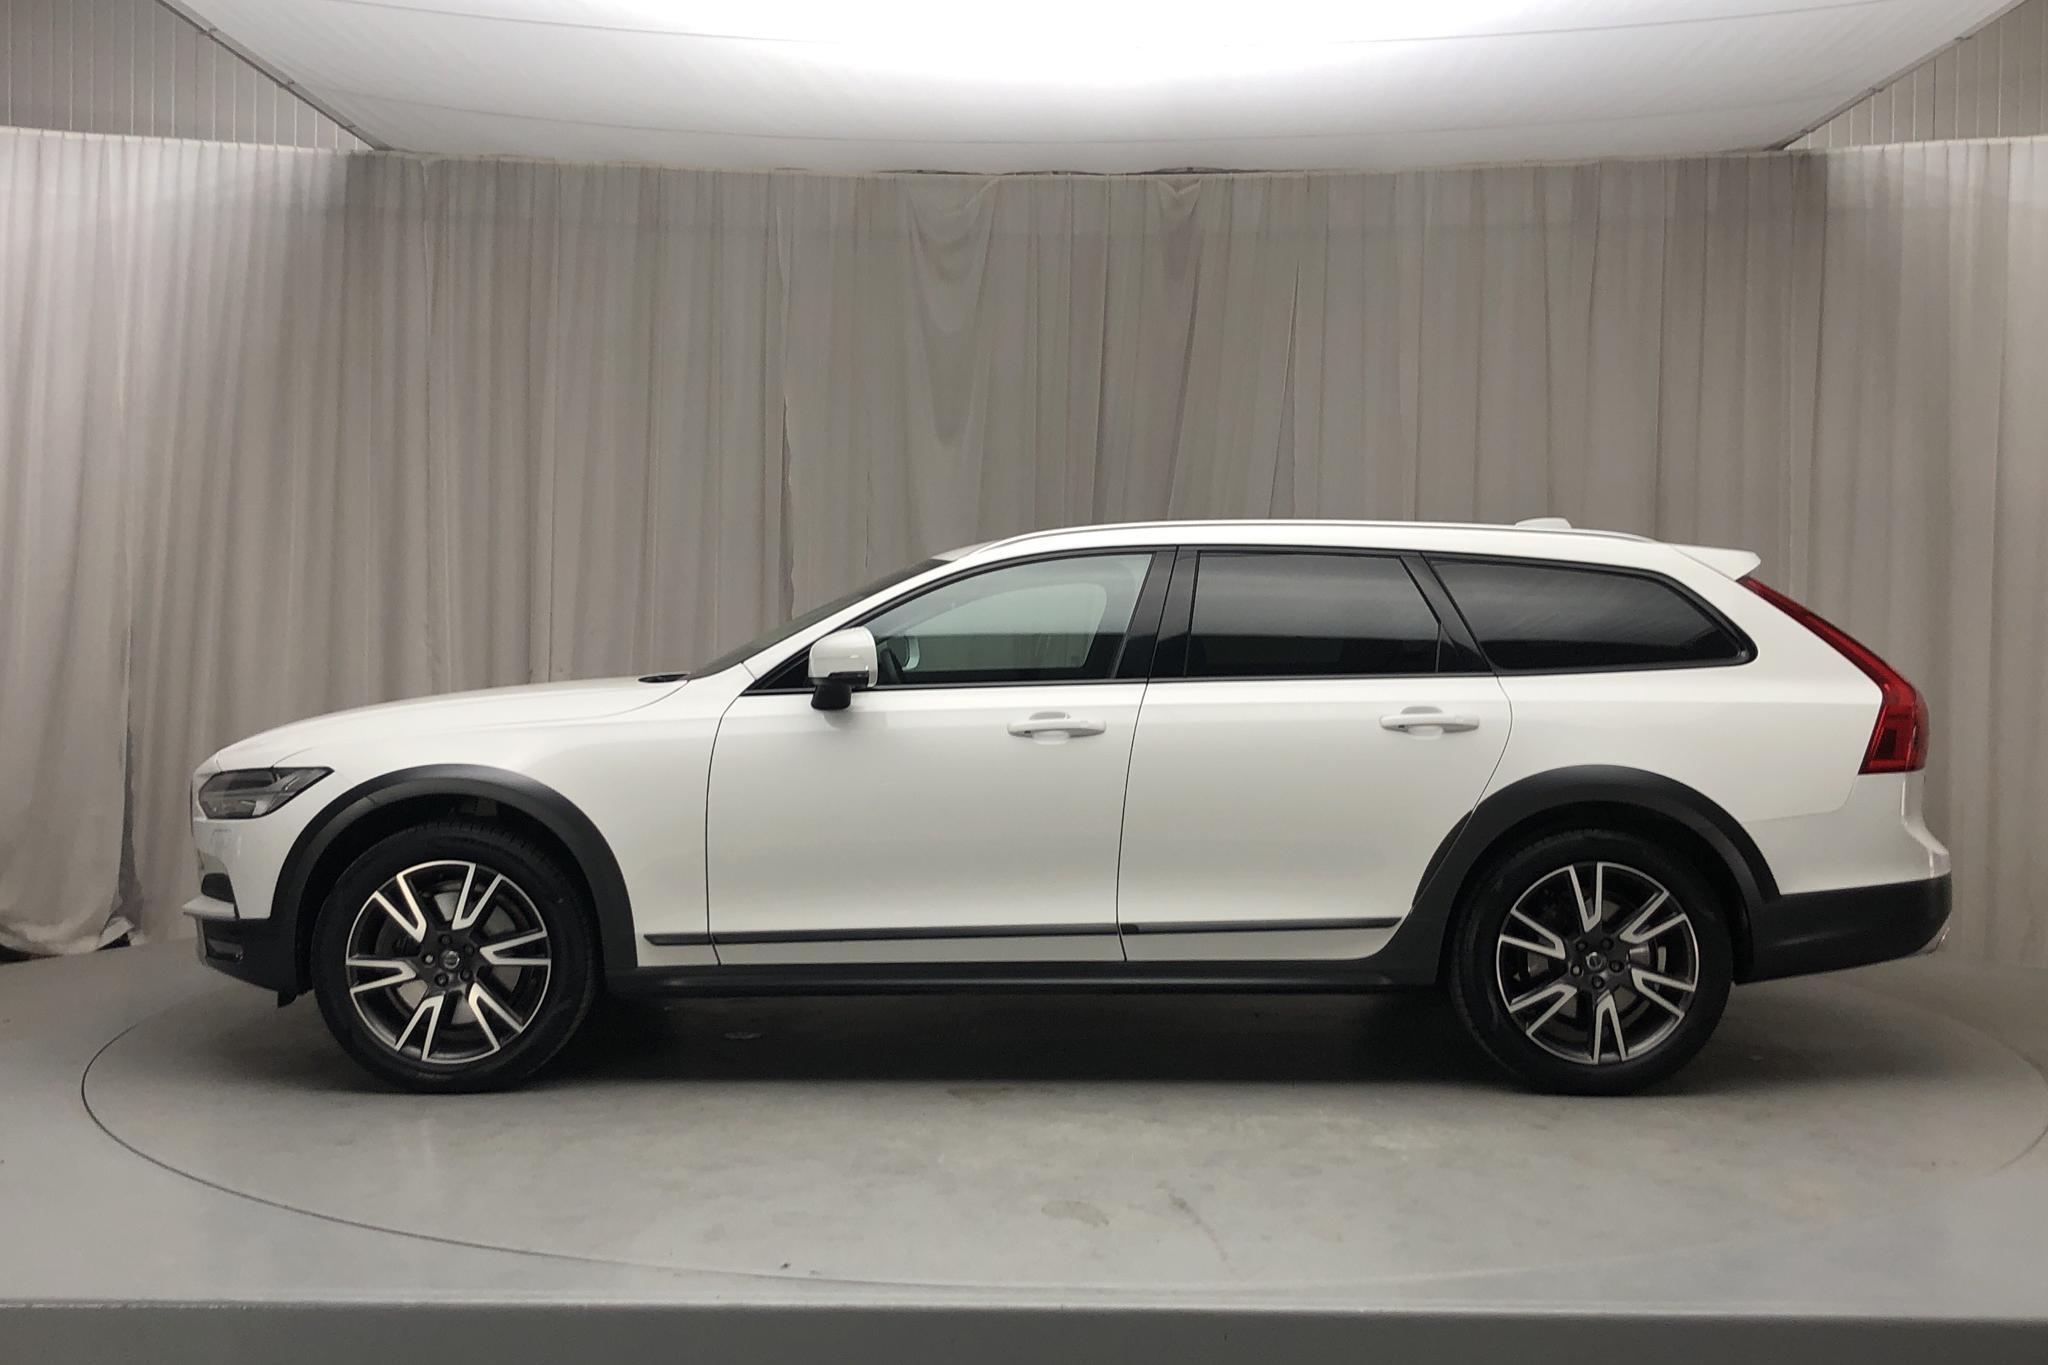 Volvo V90 D4 Cross Country AWD (190hk) - 49 690 km - Automatic - white - 2019